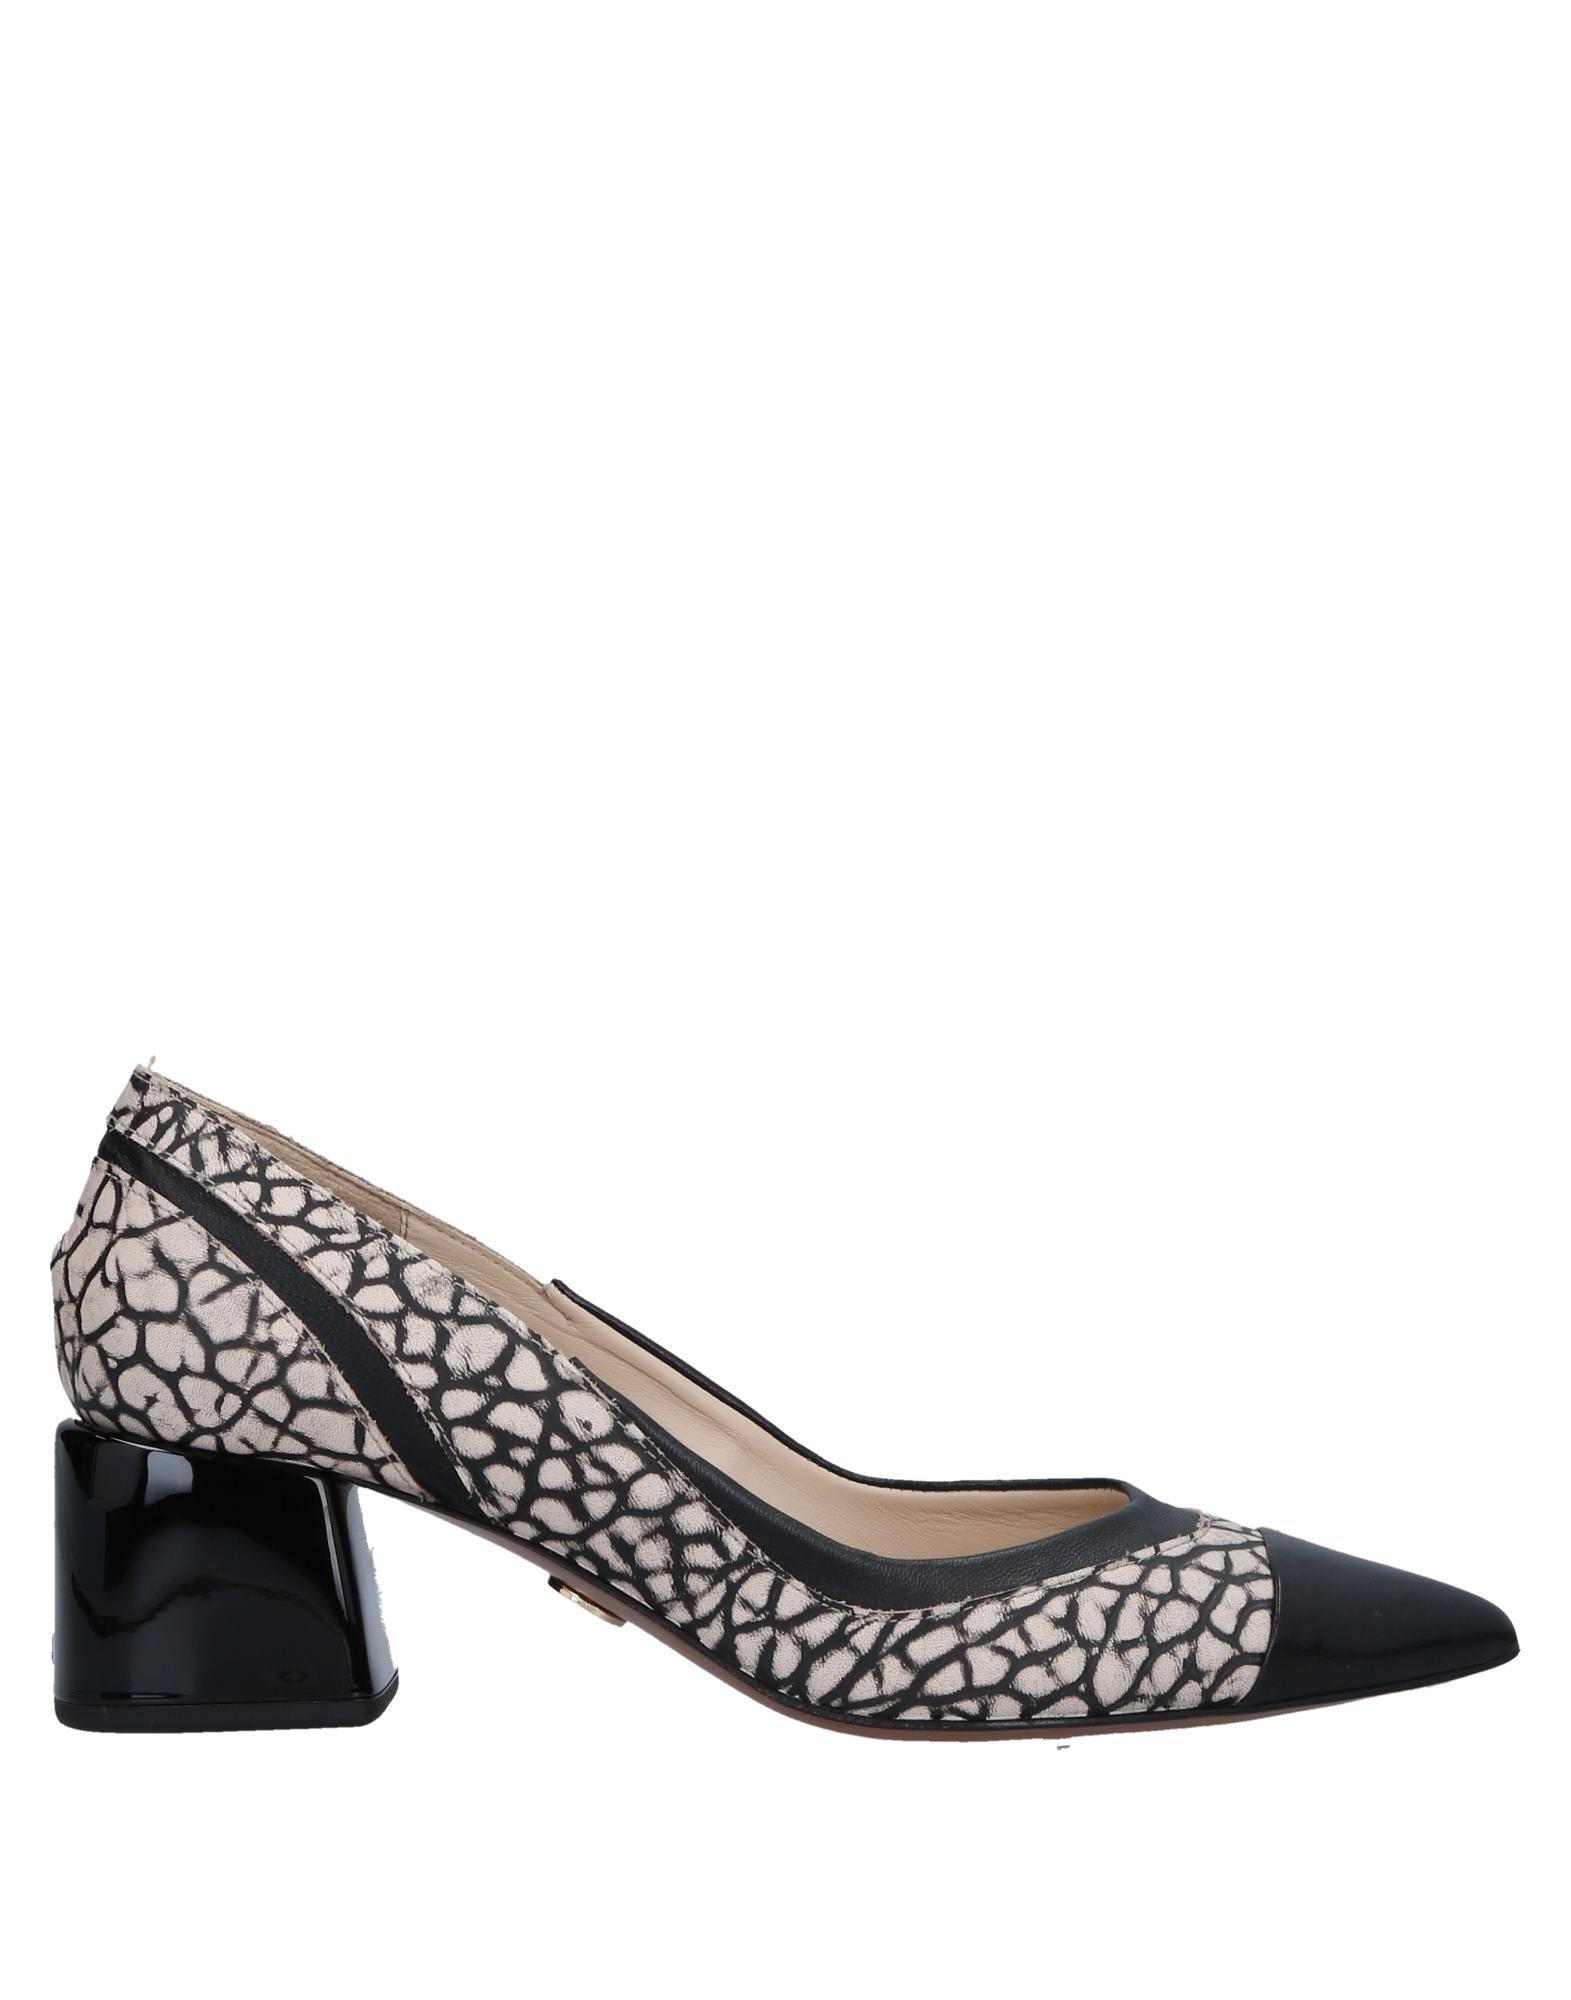 Leie Pumps Damen  11534150RC Gute Qualität beliebte Schuhe